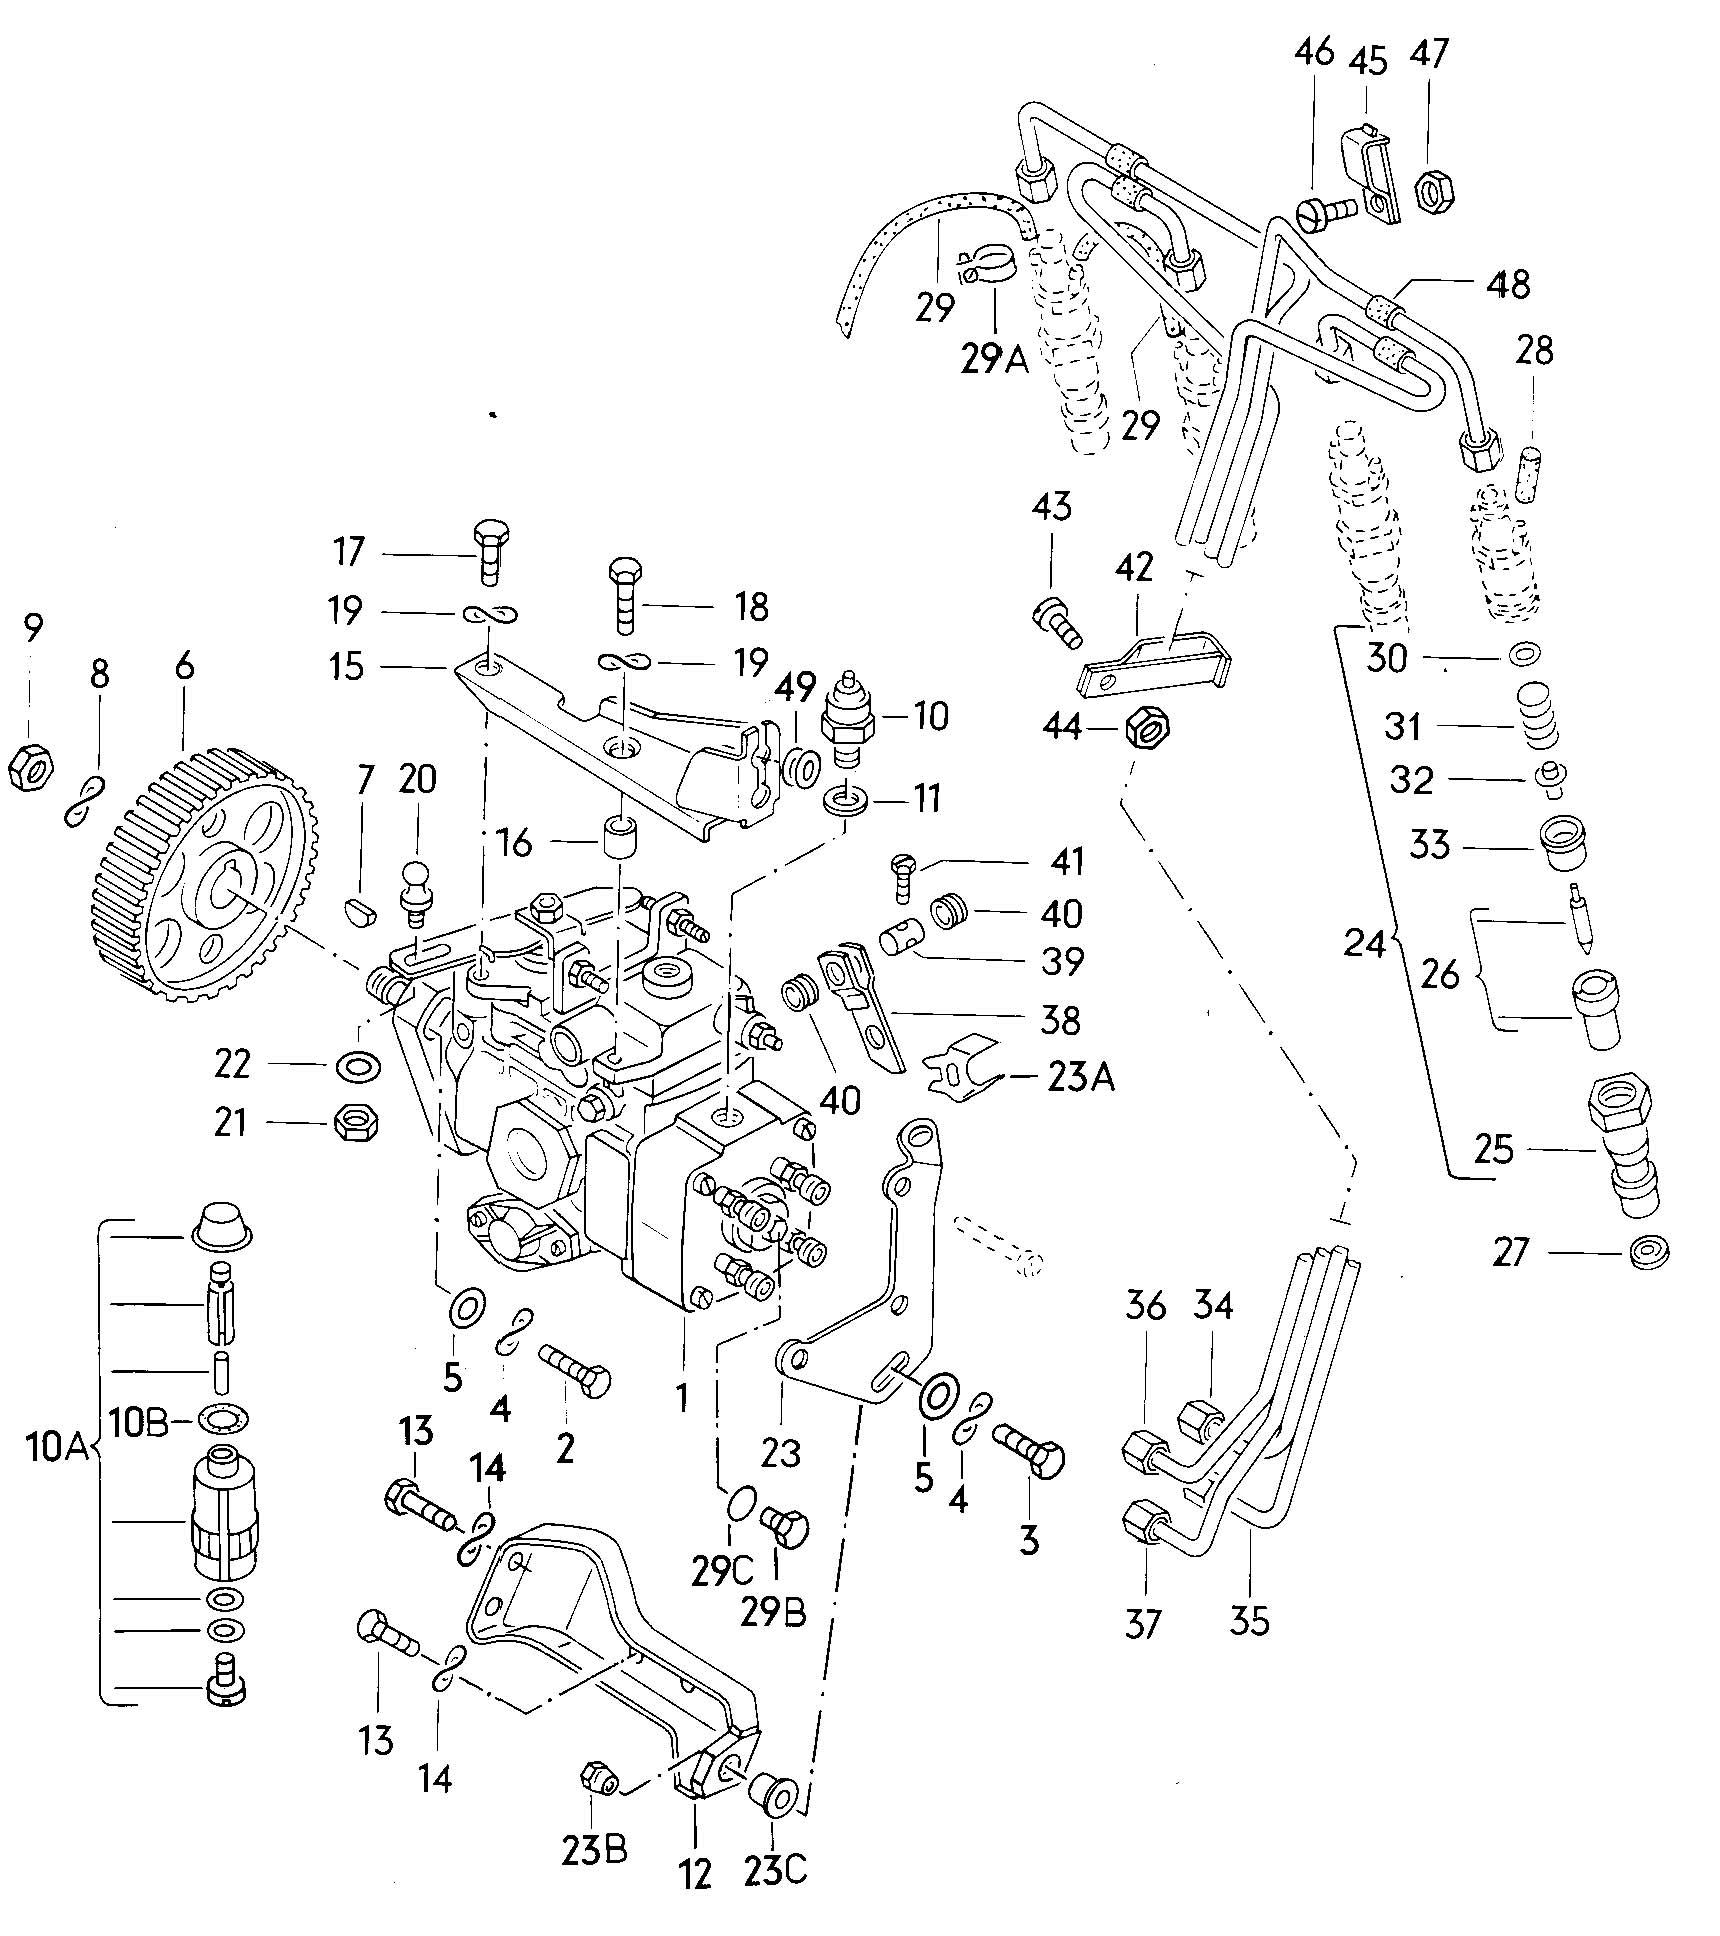 Diagram  Whirlpool Cabrio Wiring Diagram Full Version Hd